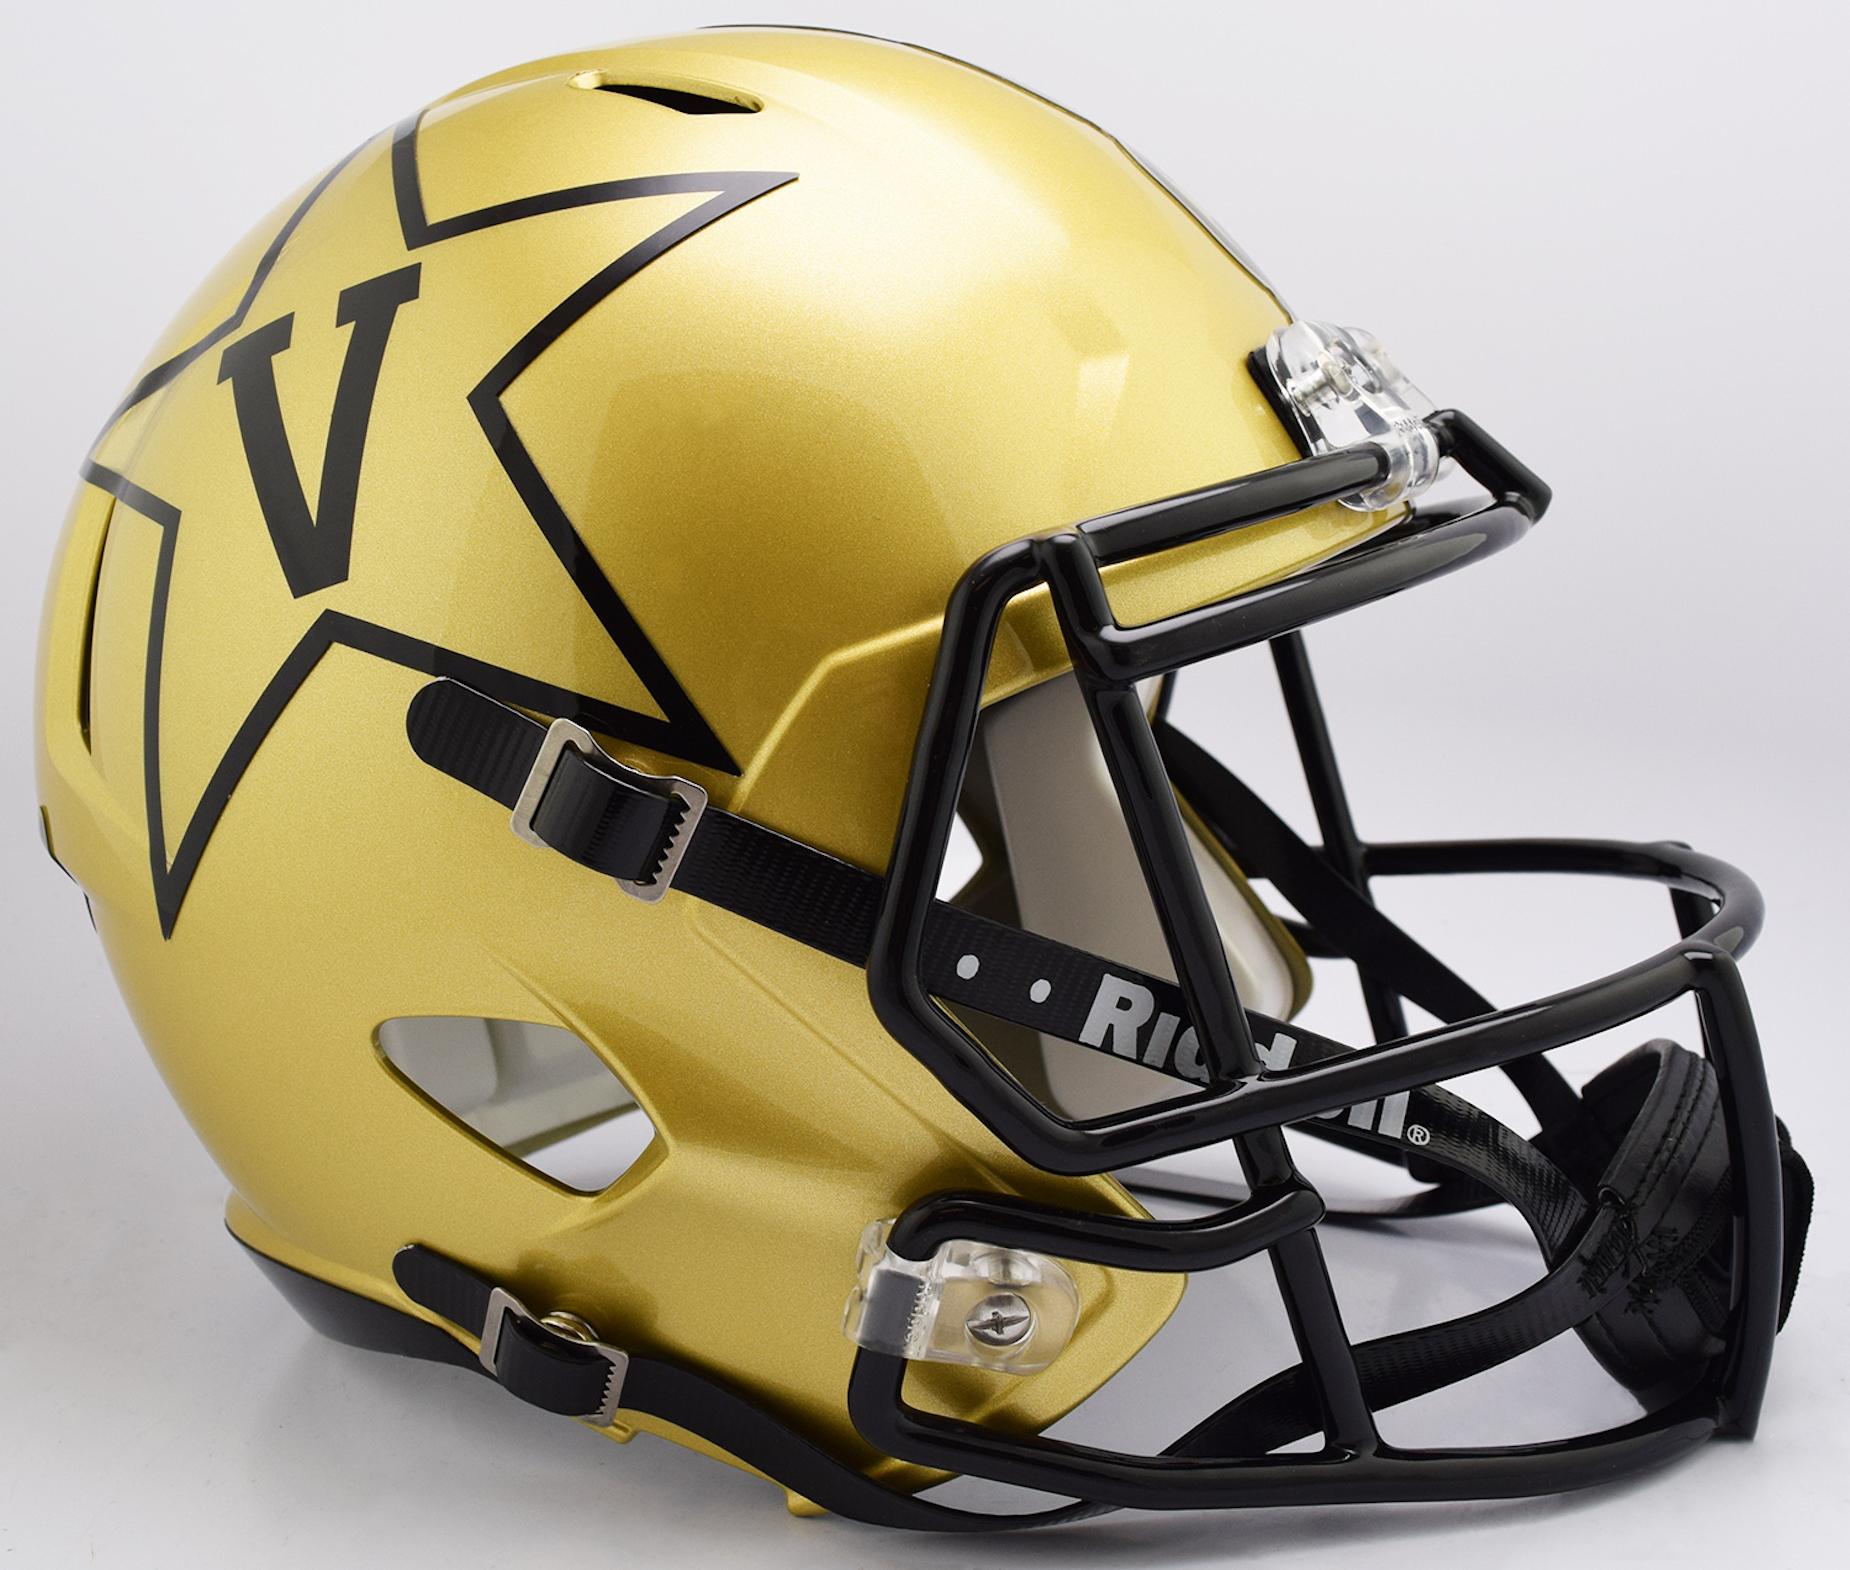 Vanderbilt Commodores Speed Replica Football Helmet <B>GOLD NEW 2018</B>